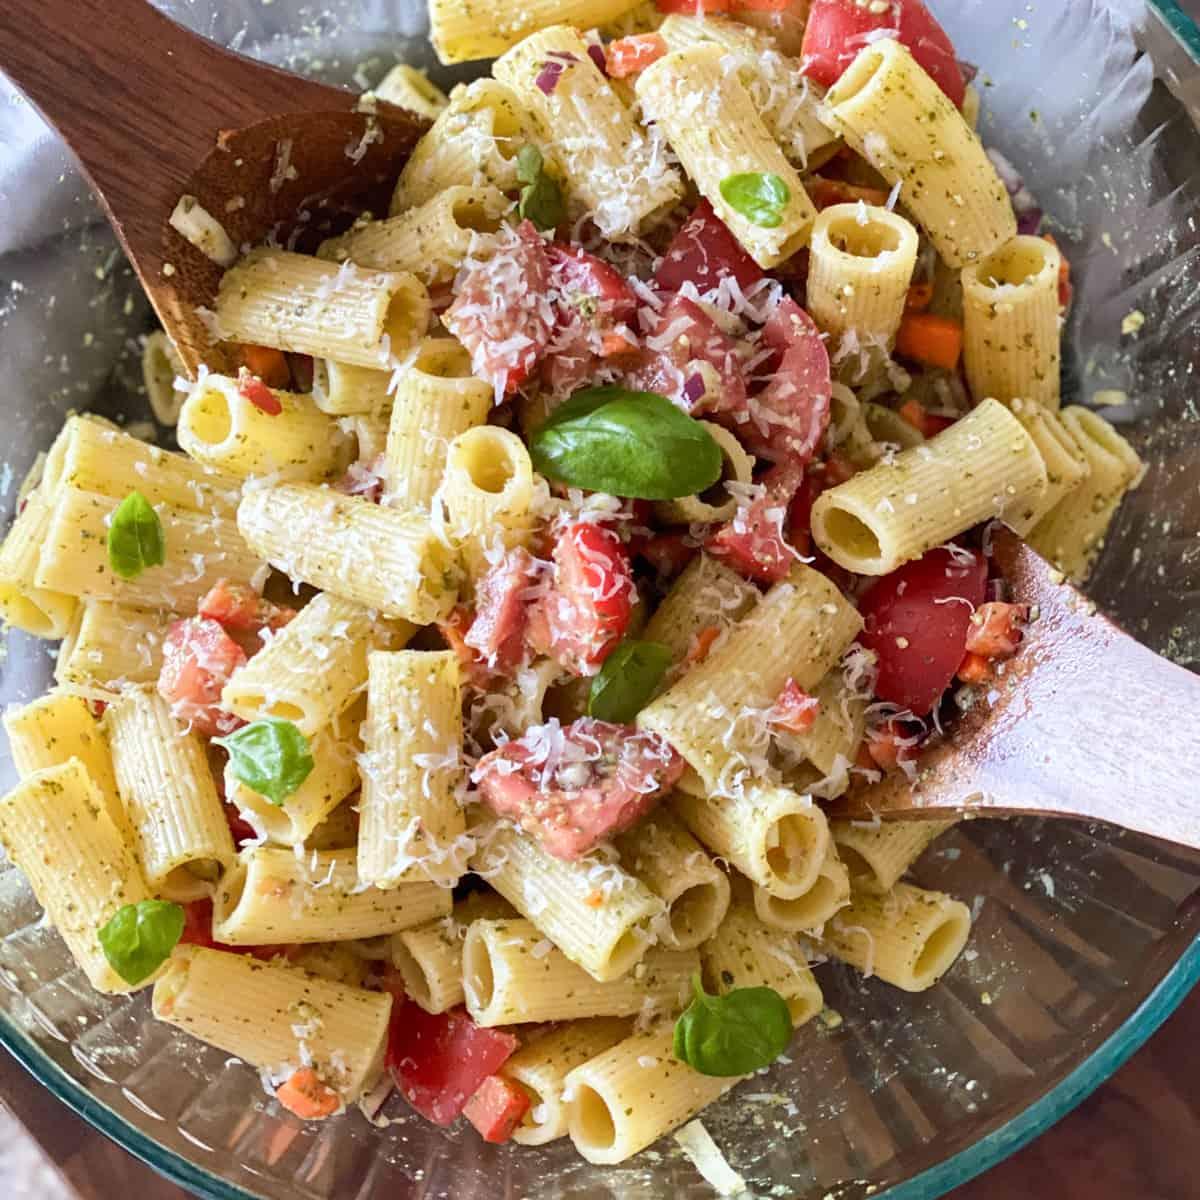 Example of rigatoni pasta